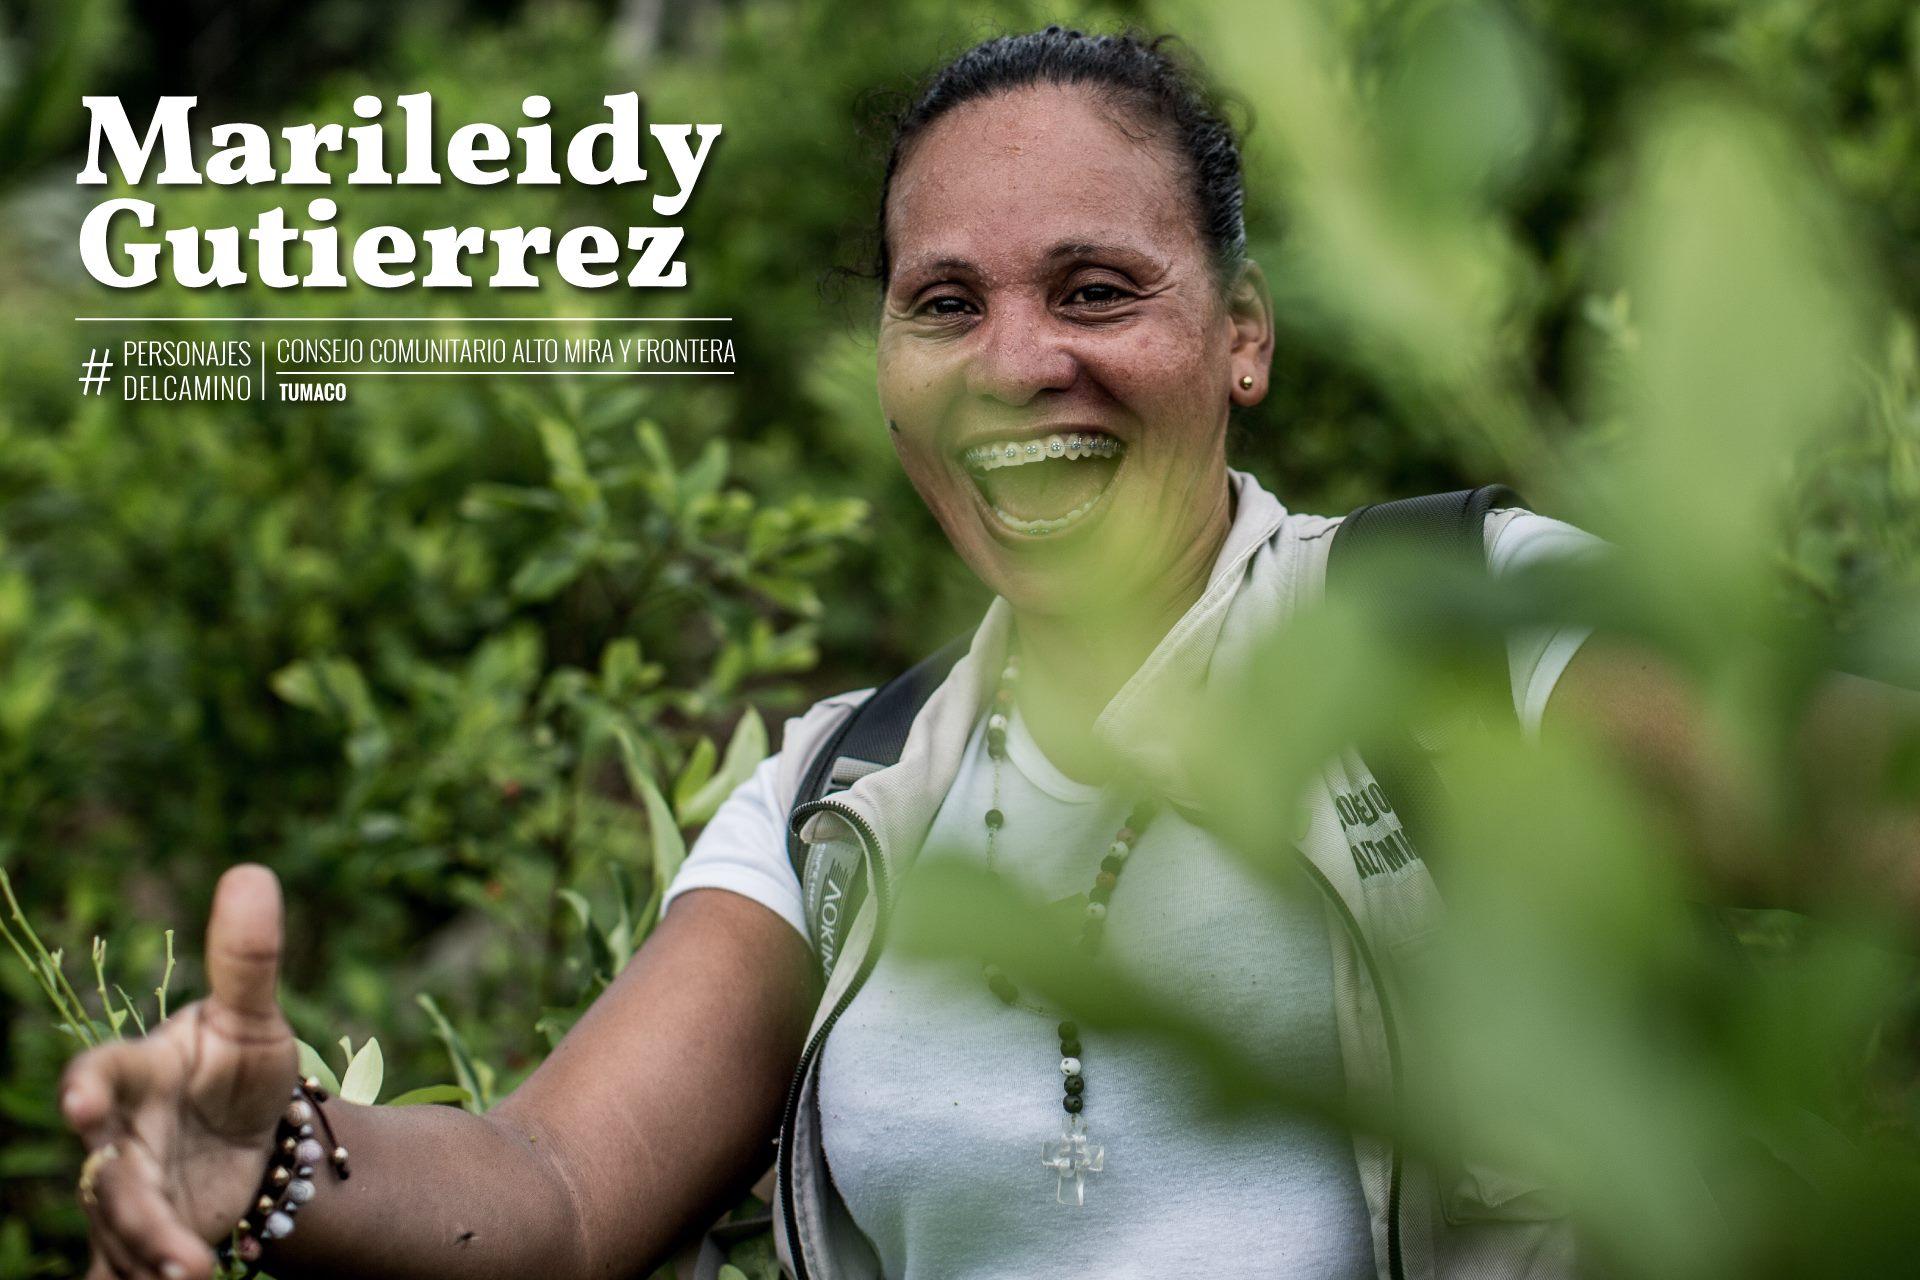 Marileidy Gutierrez